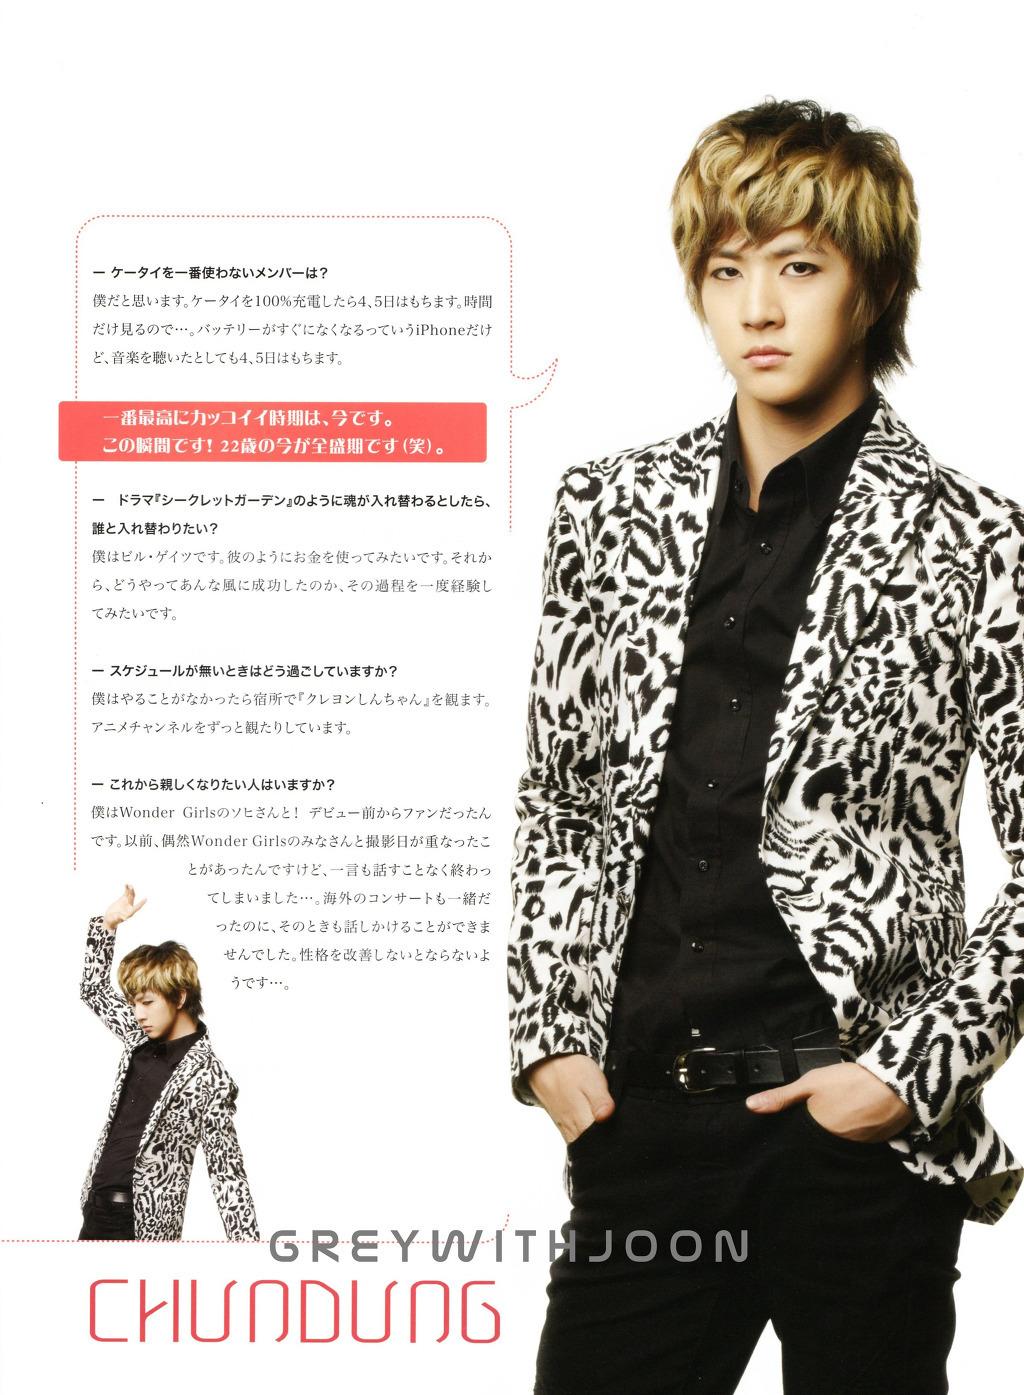 [01.03.11]MBLAQ @ CREA STAR Scan7